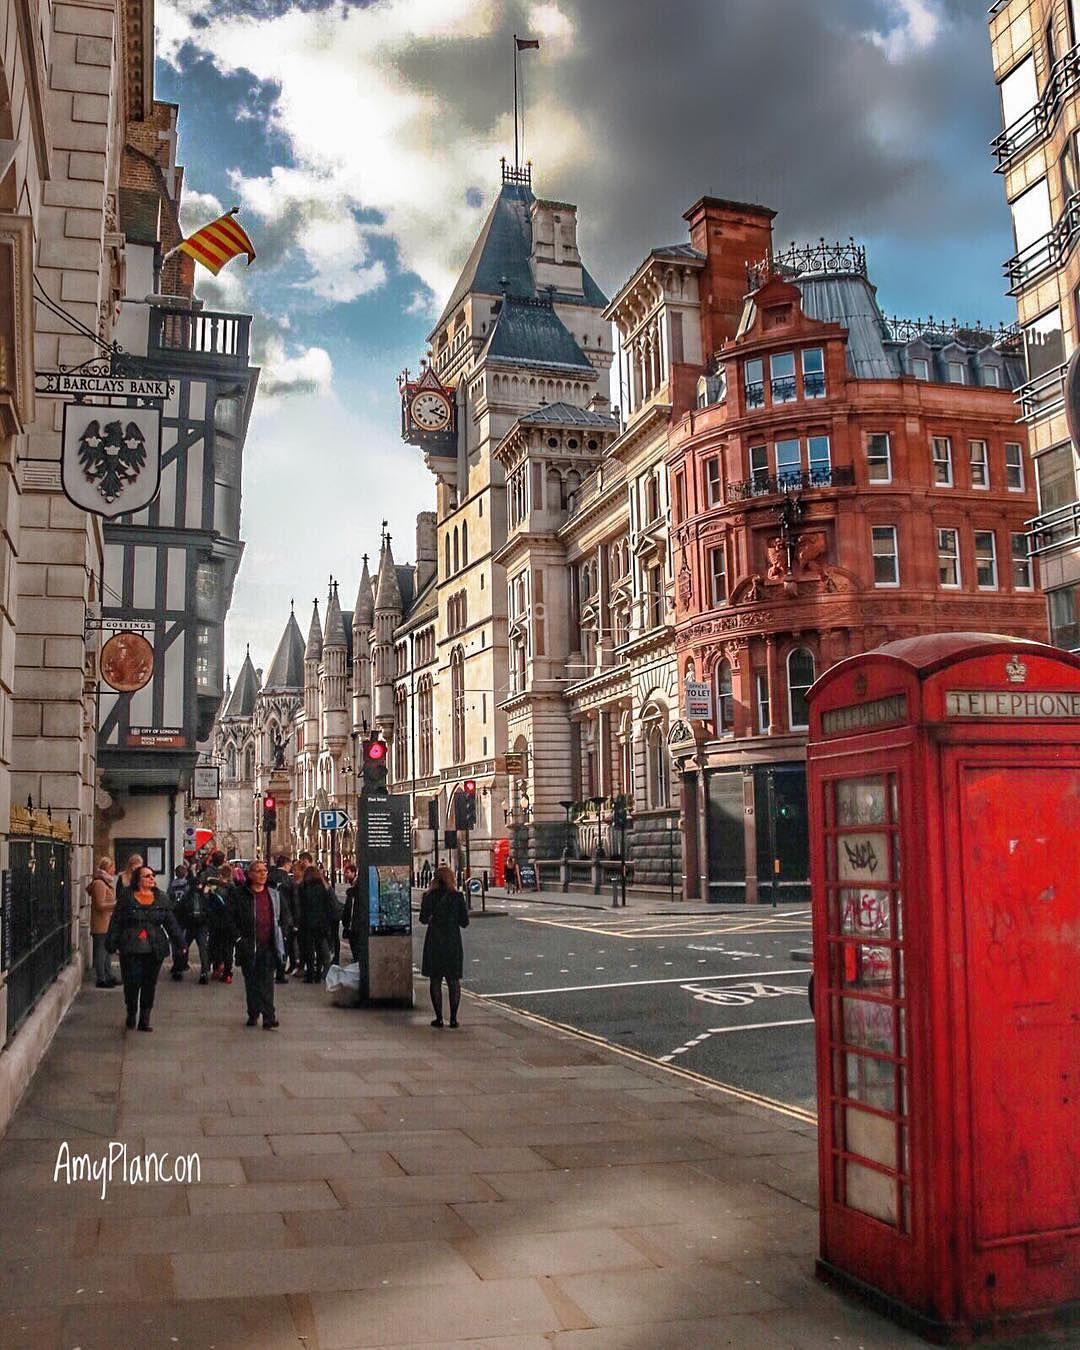 We Love England On Instagram Good Afternoon From Fleet Street London London Sightseeing Fleet Street London Photos